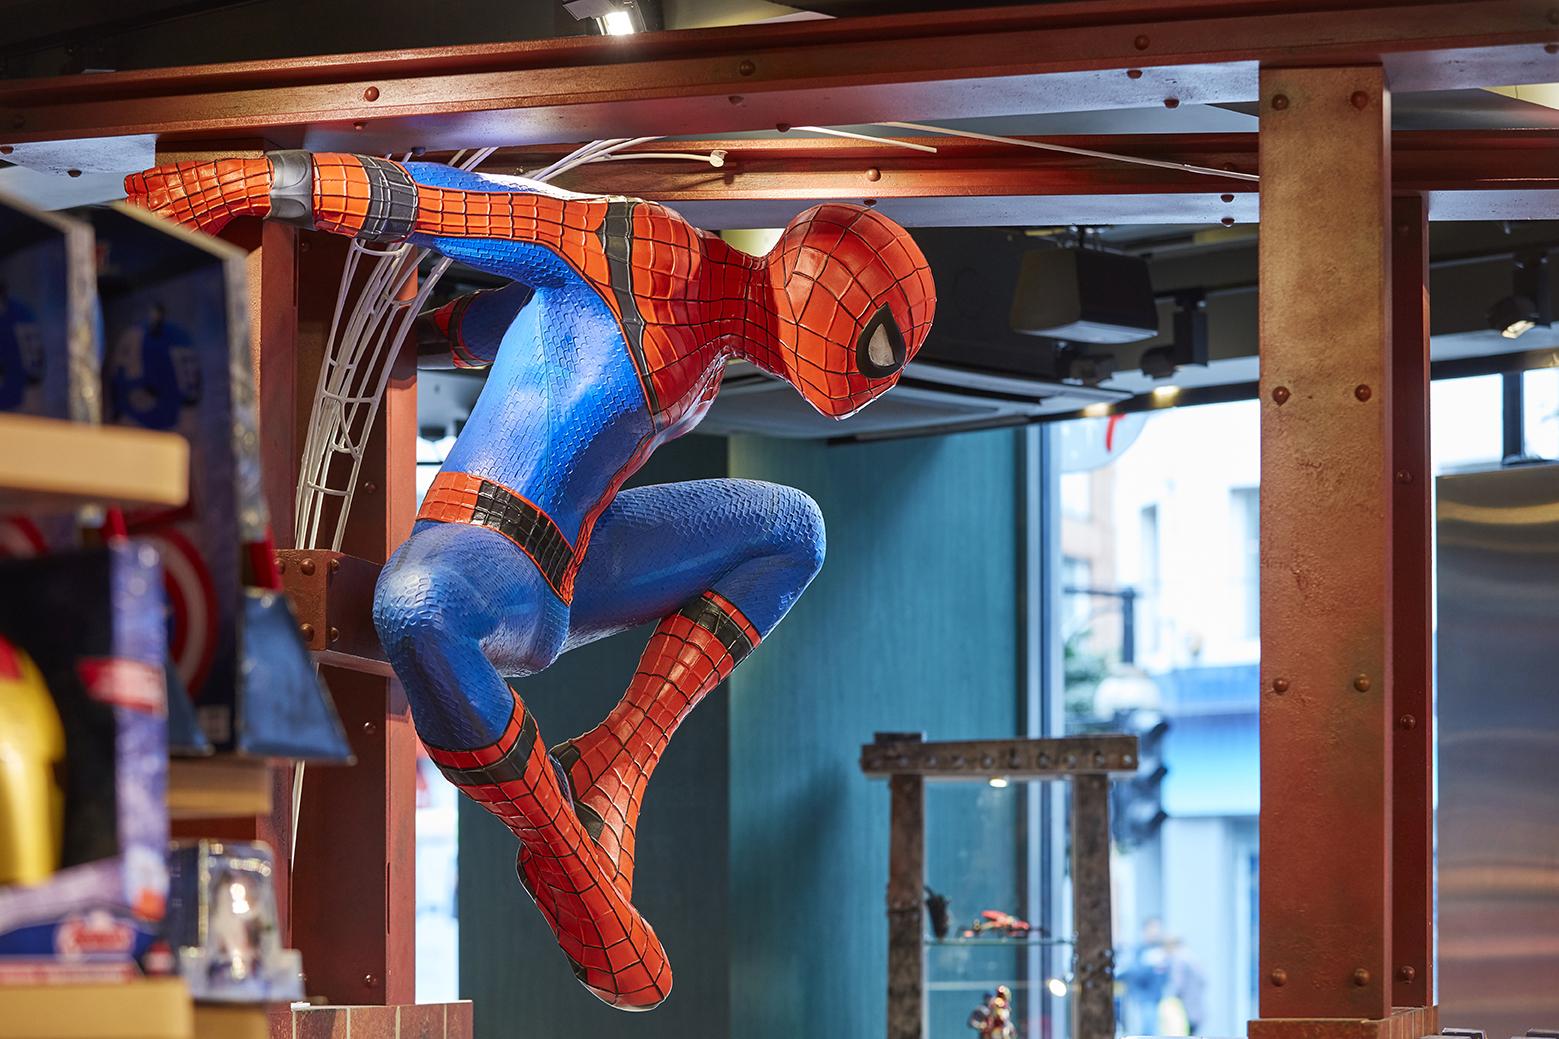 Propability, Disney Store, SpiderMan, Spiderman Homecoming, Prop.jpg